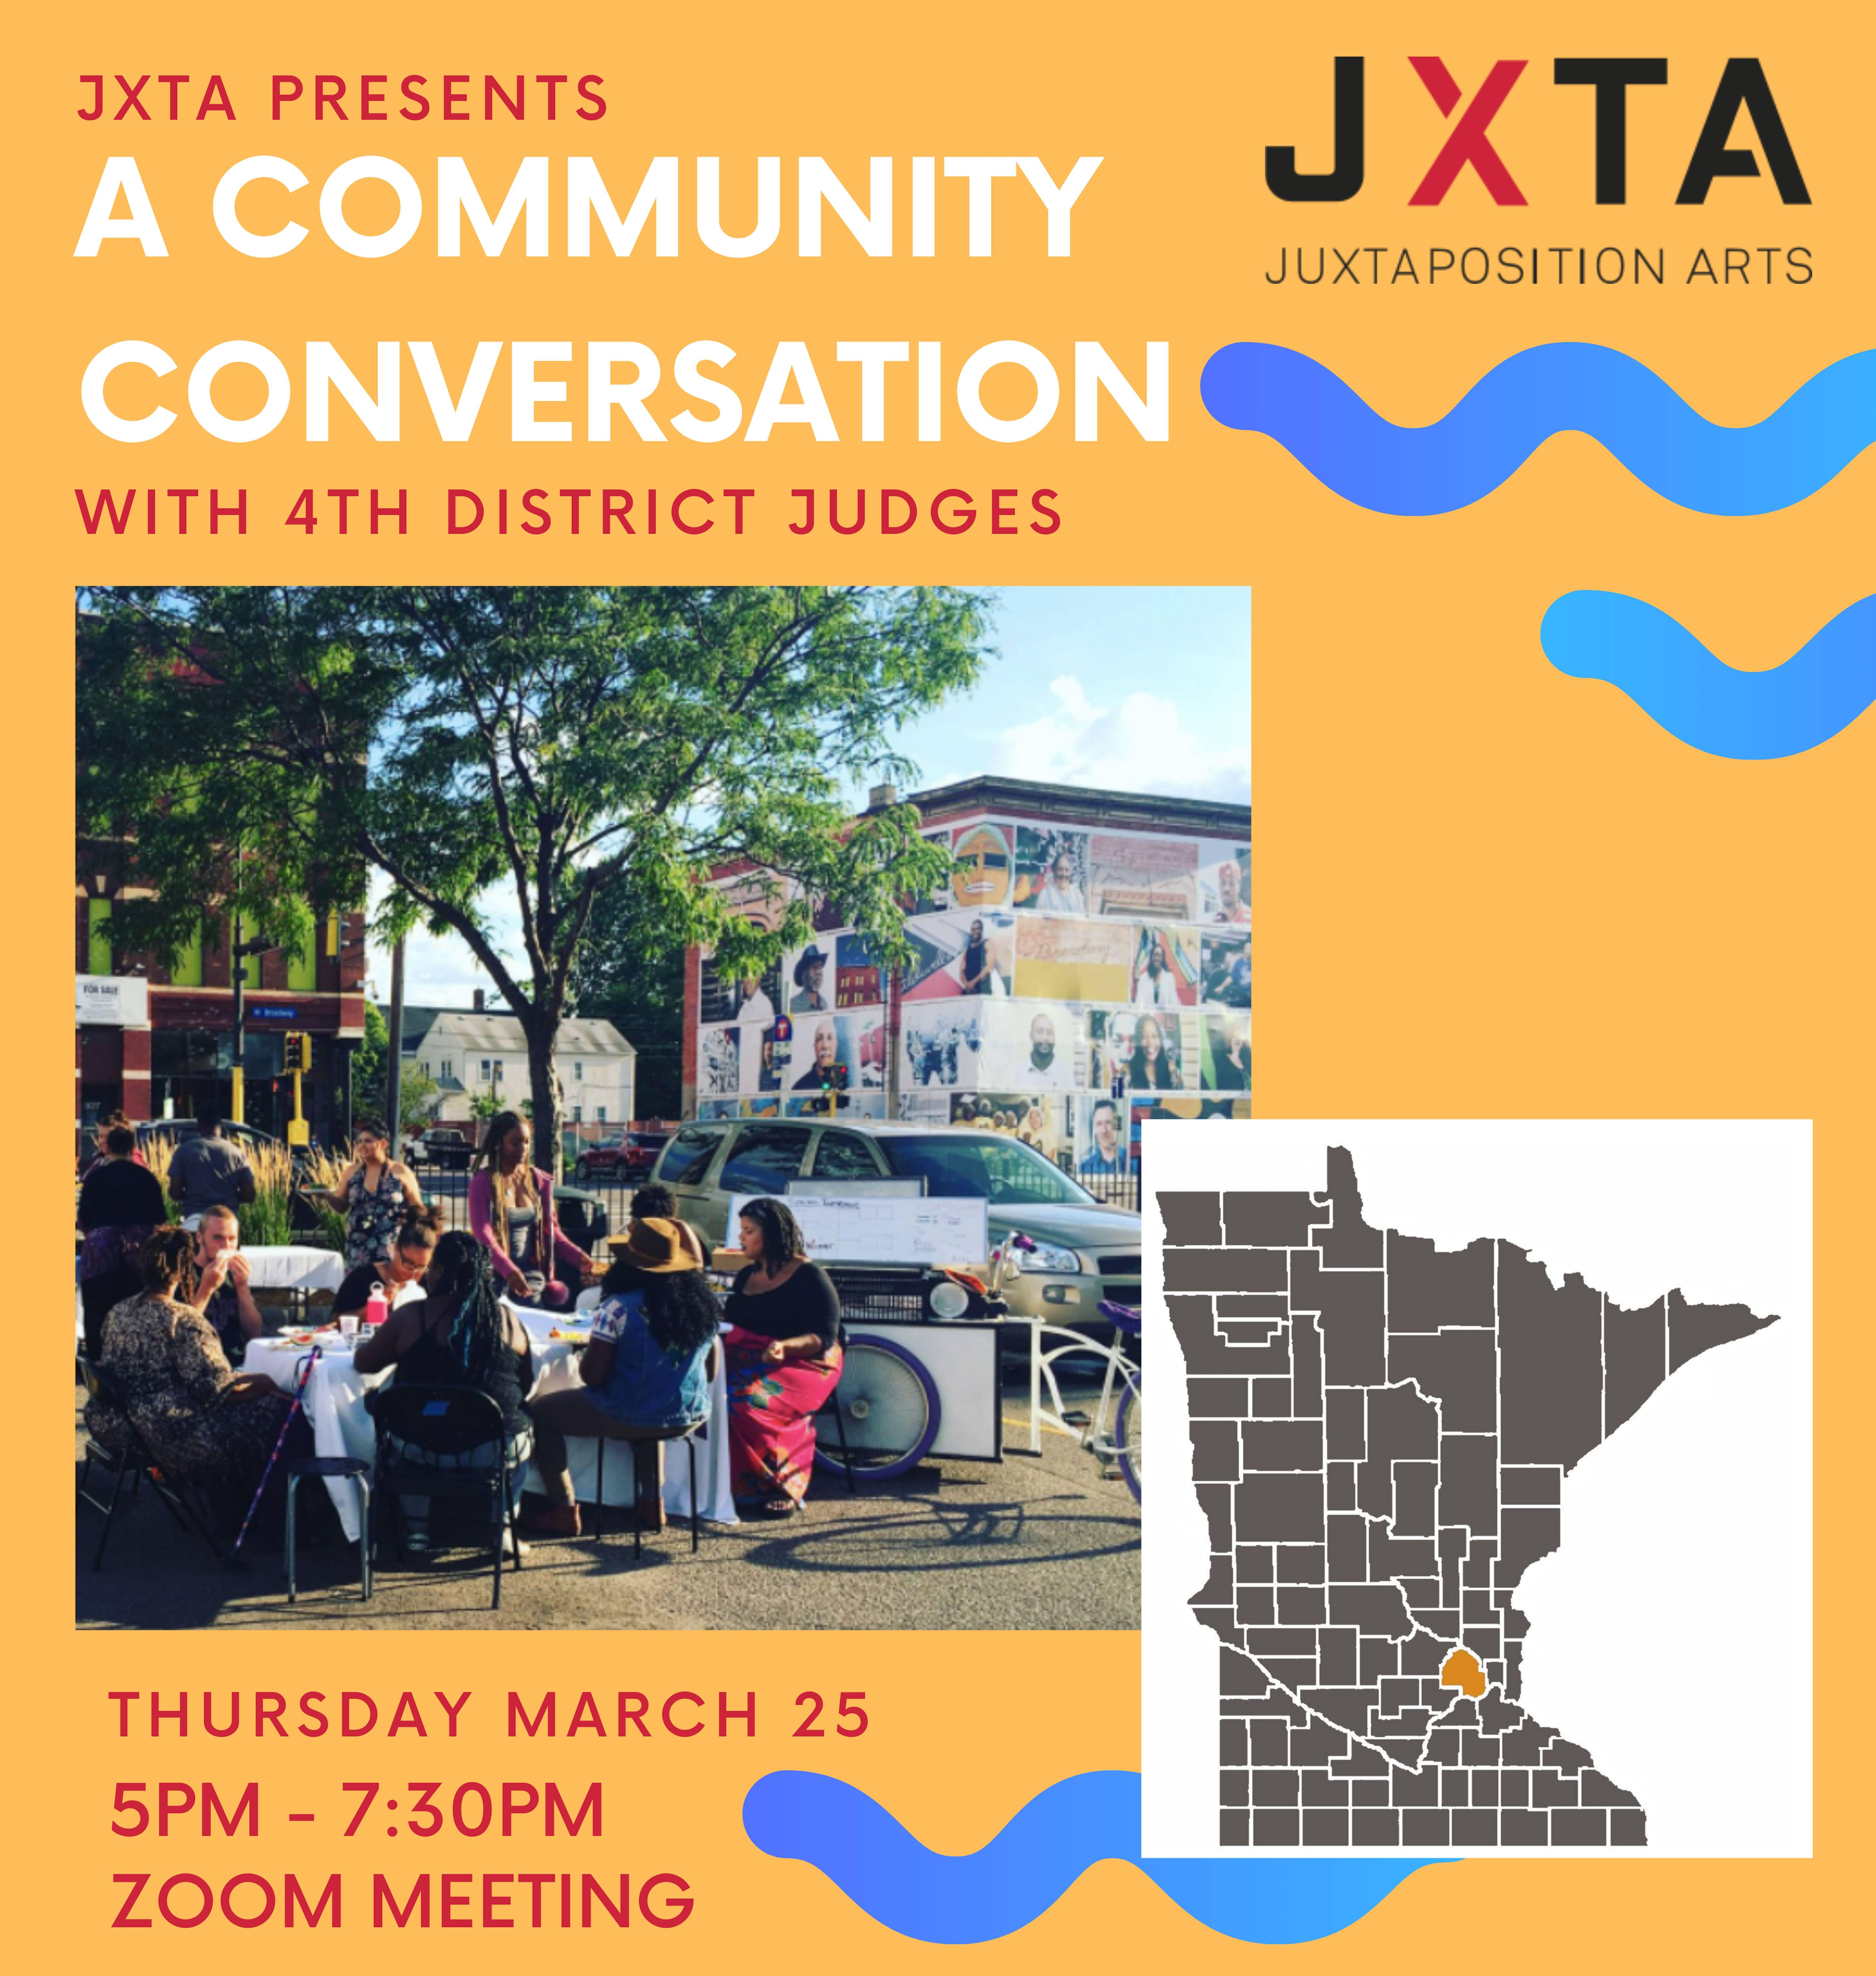 Flyer for 4th district judges community conversation